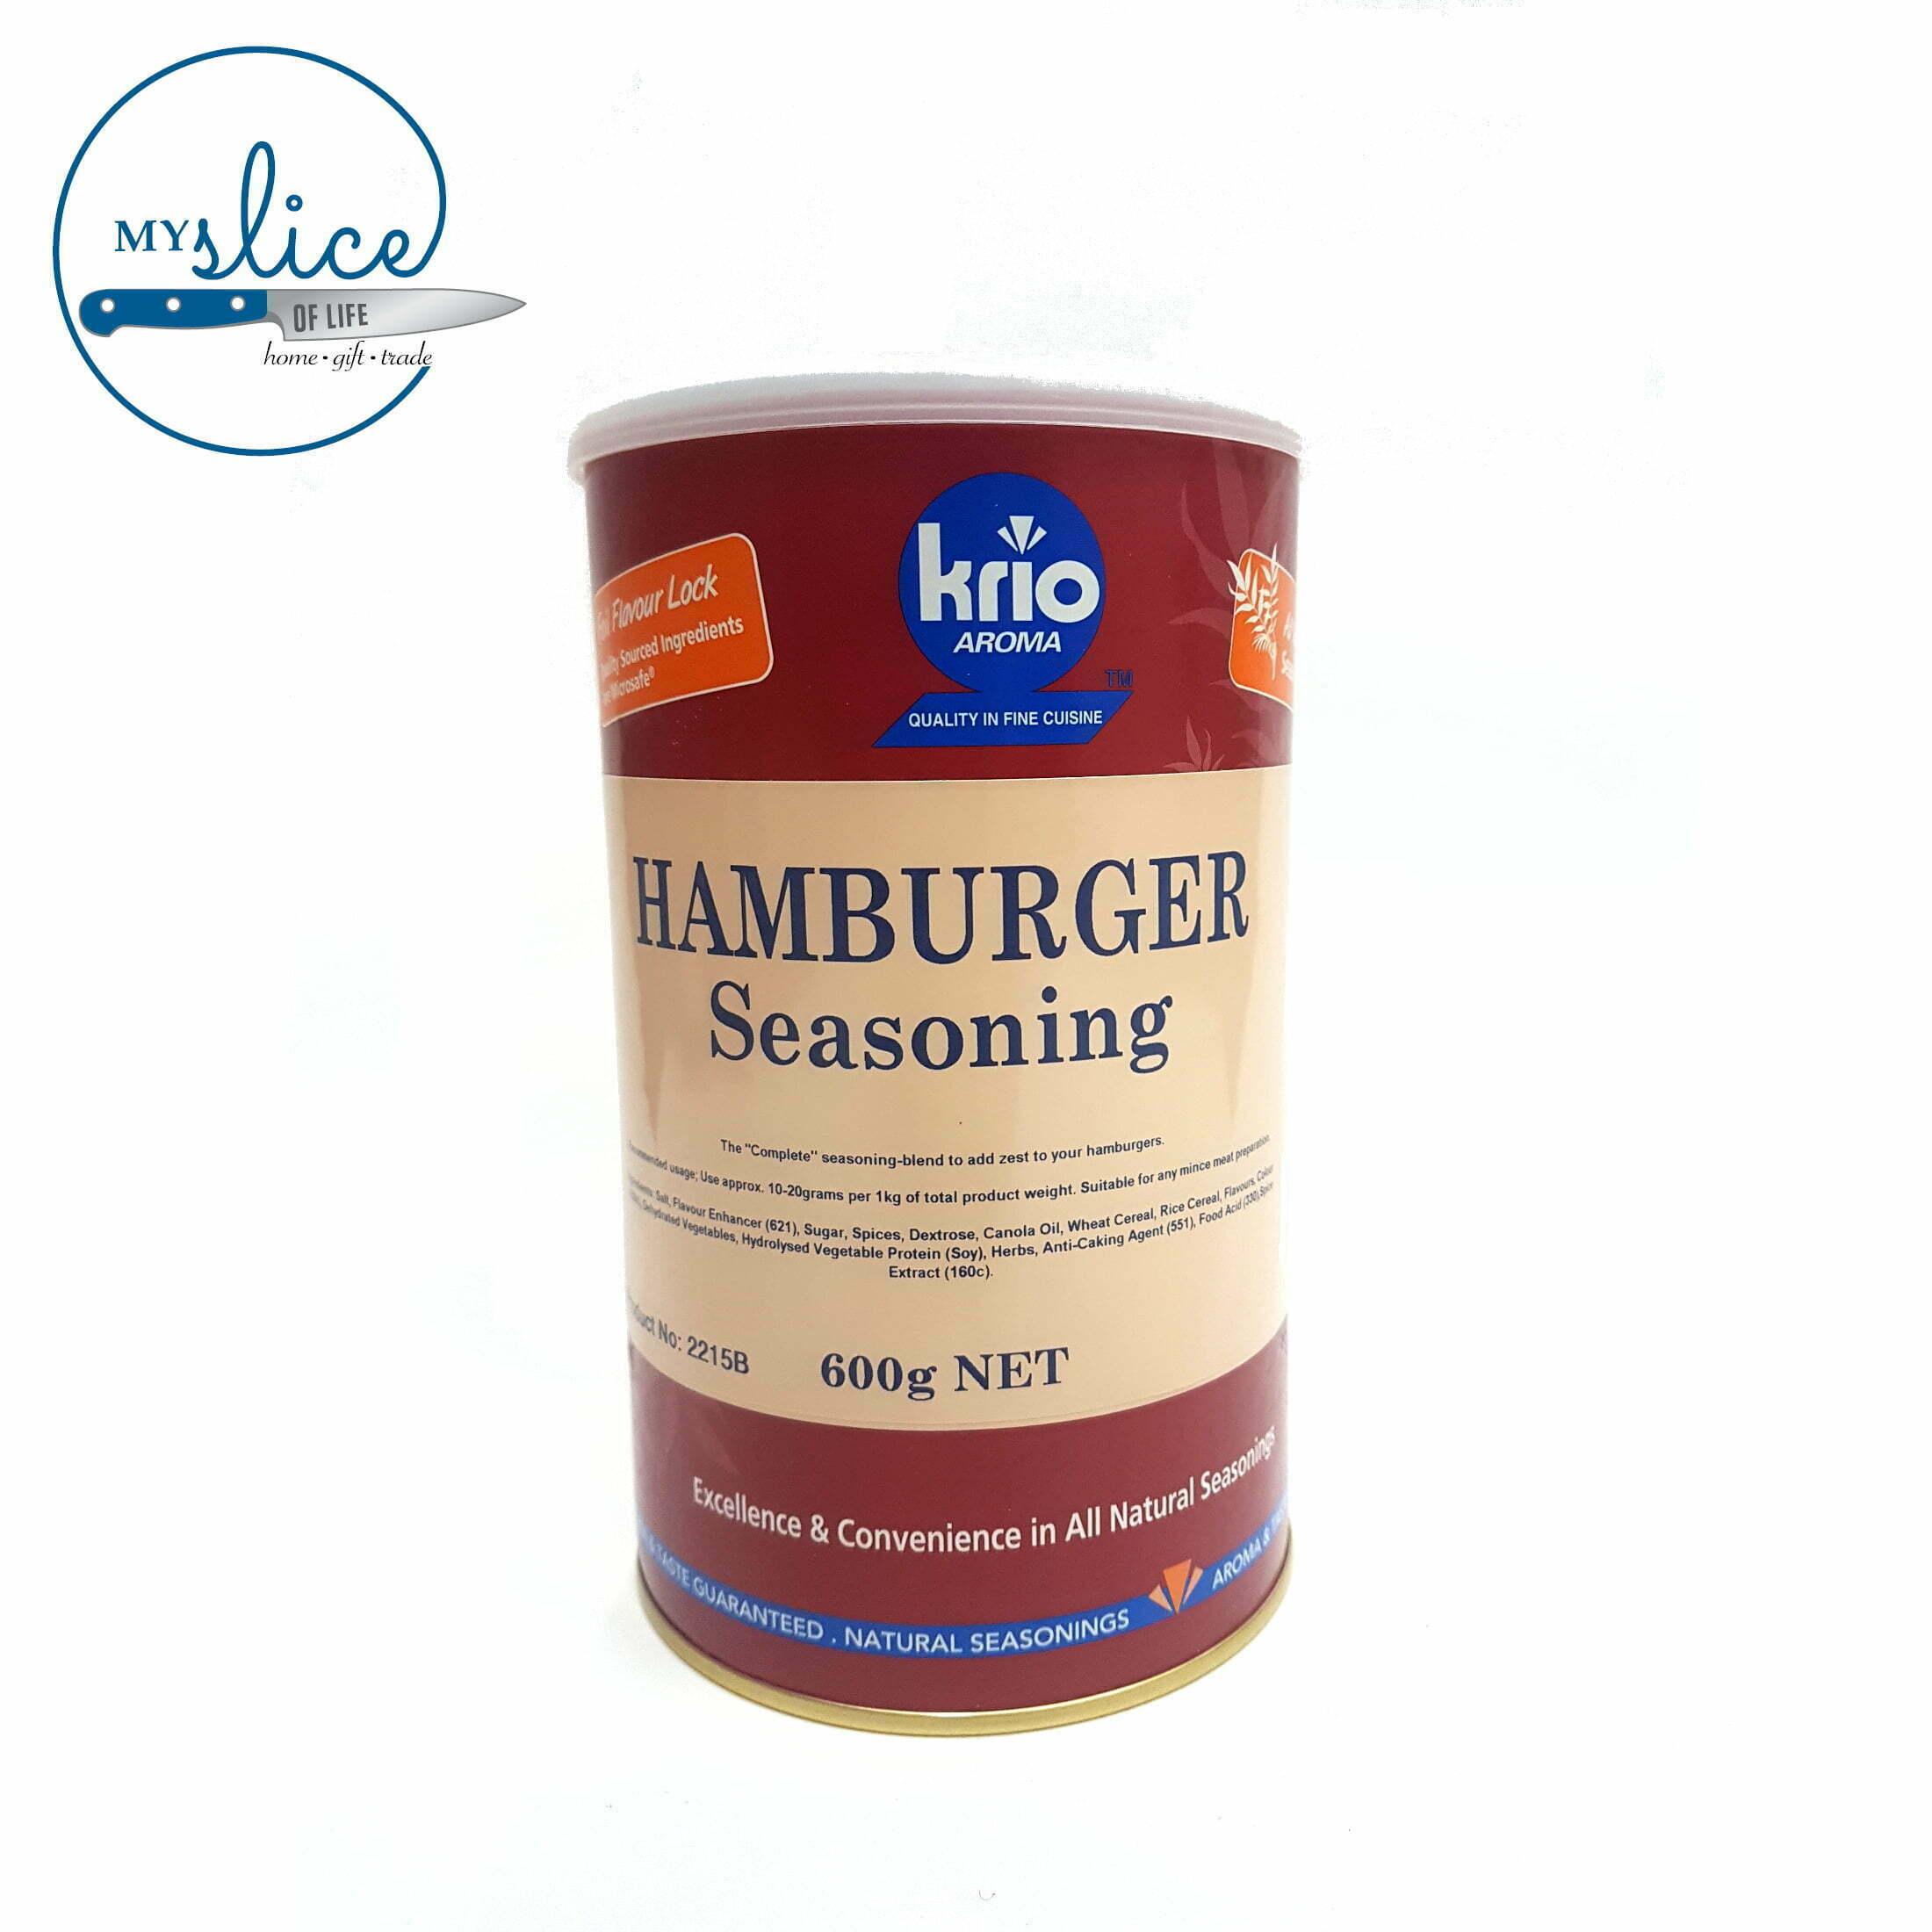 Krio Hamburger Seasoning 600g Canister My Slice Of Life